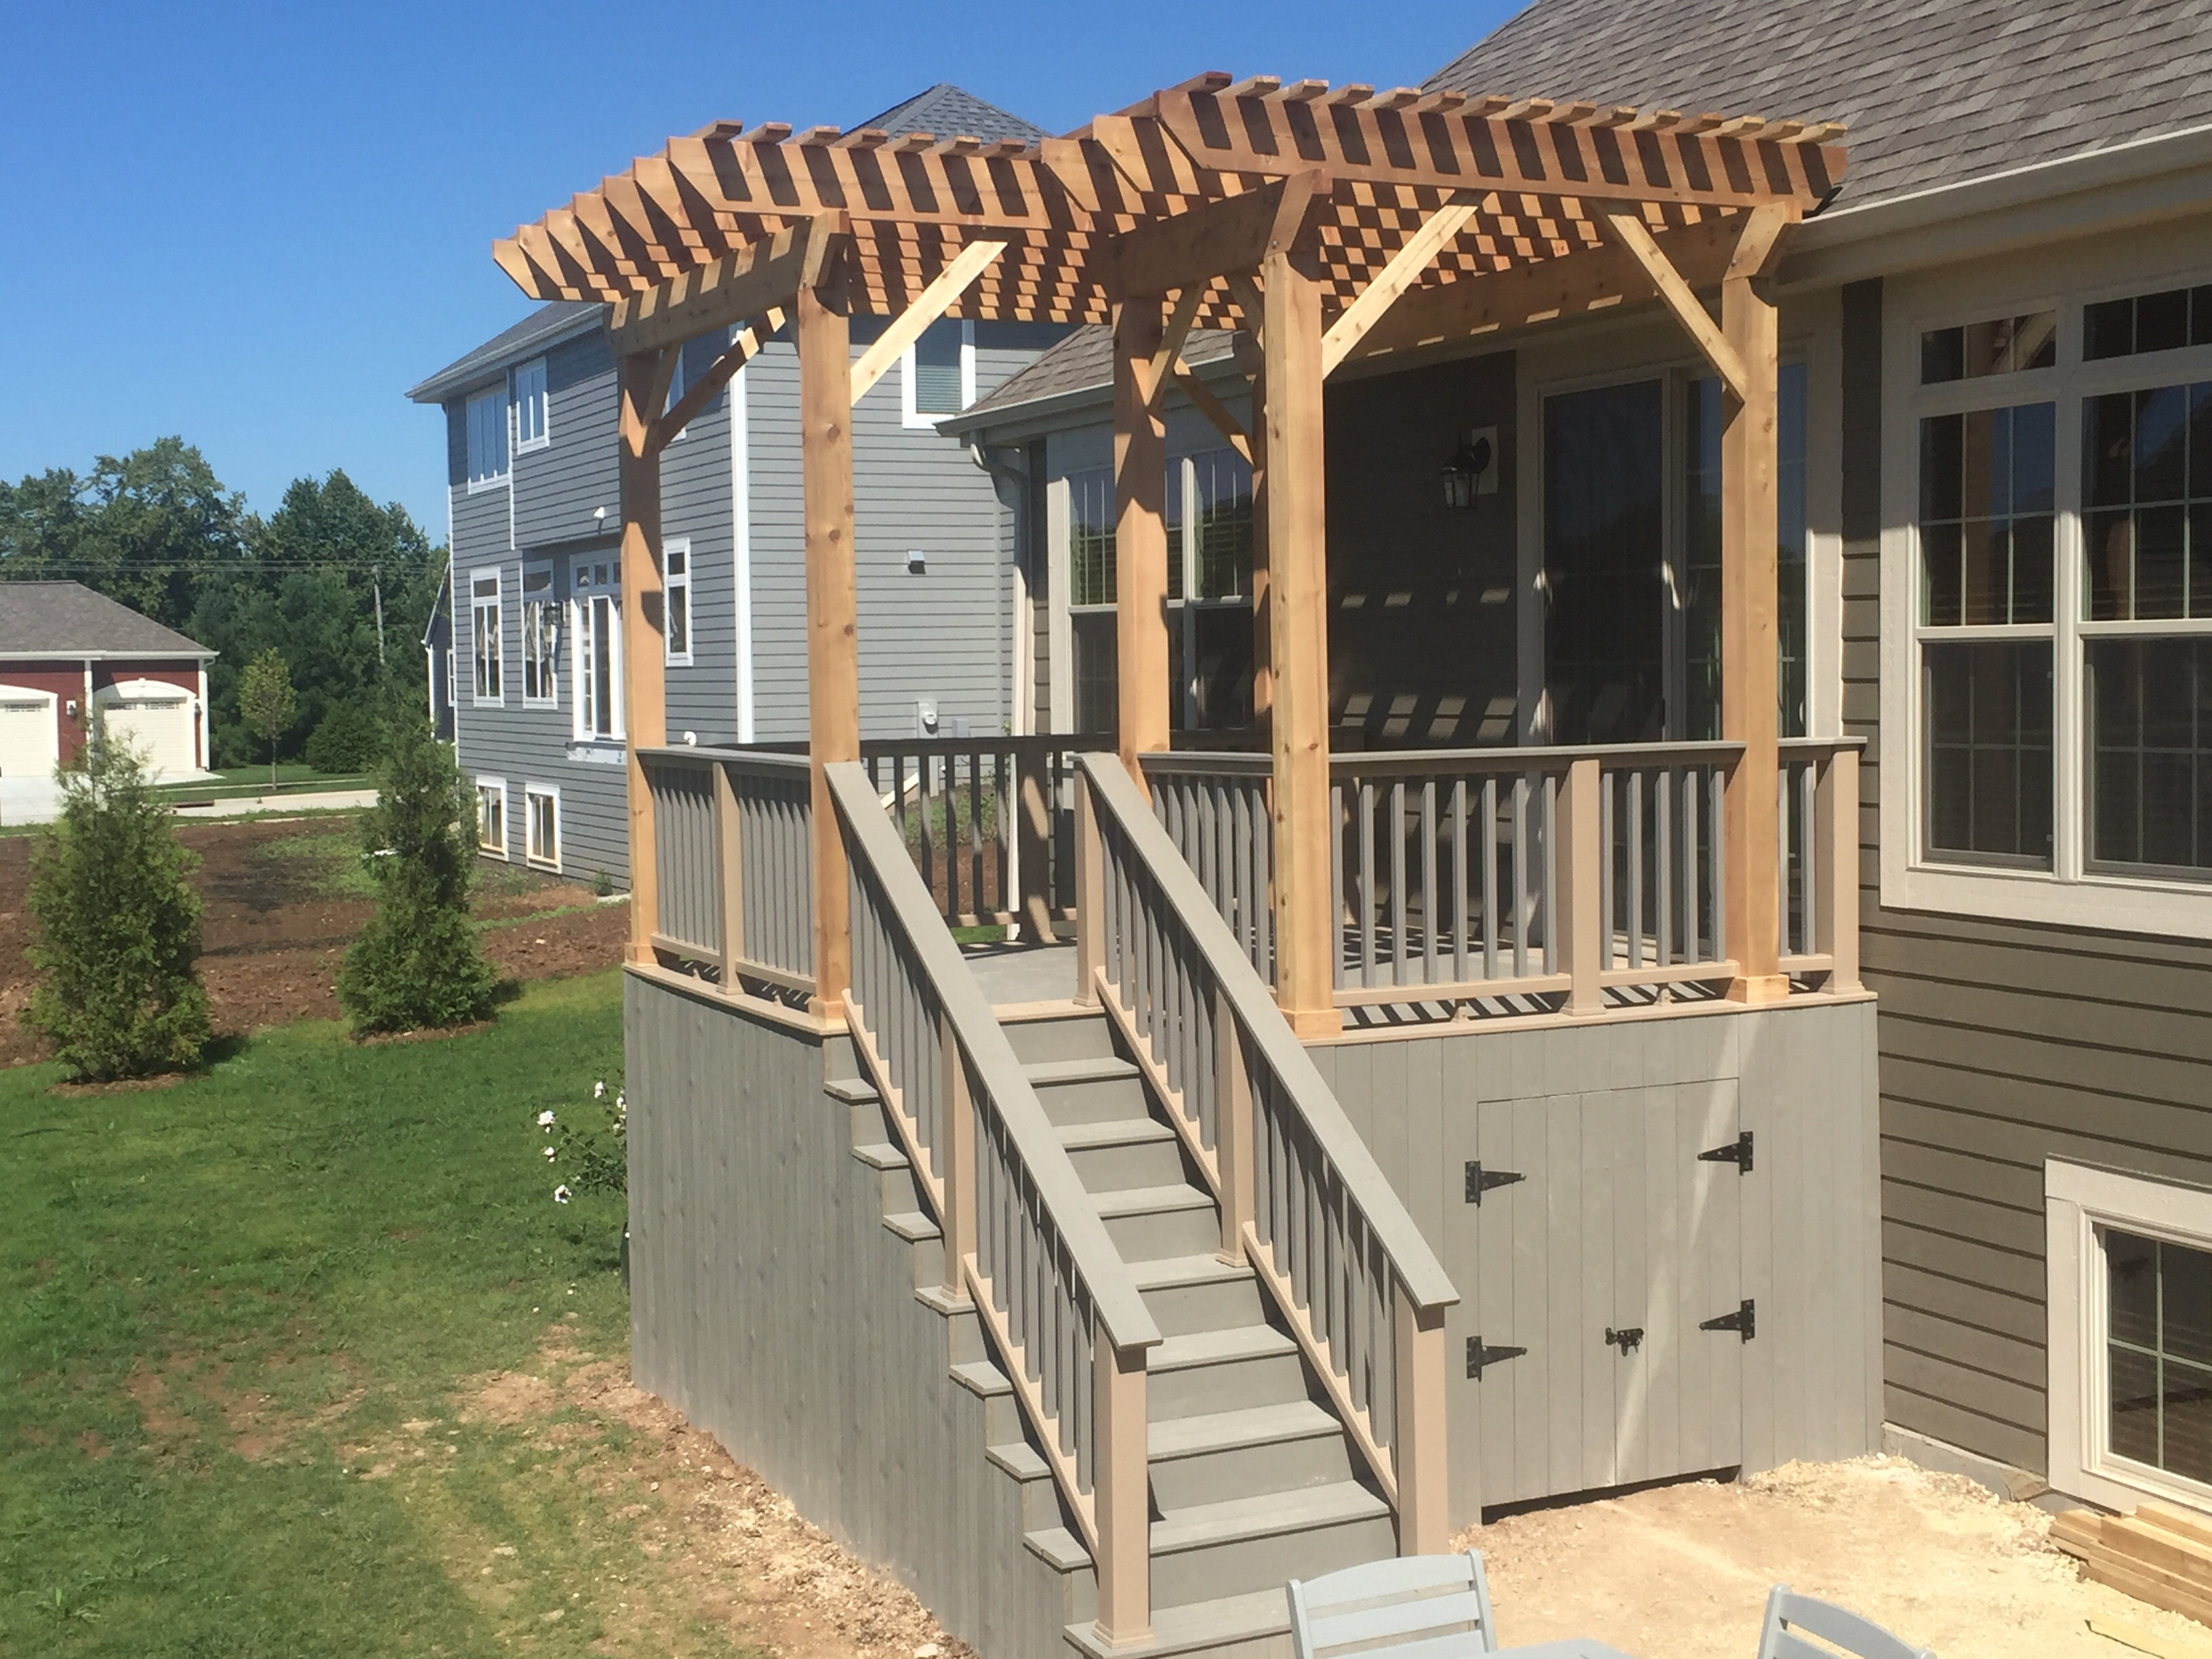 Trex Decks - AdvanceDeck and Sunroom - Trusted Illinois Contractor